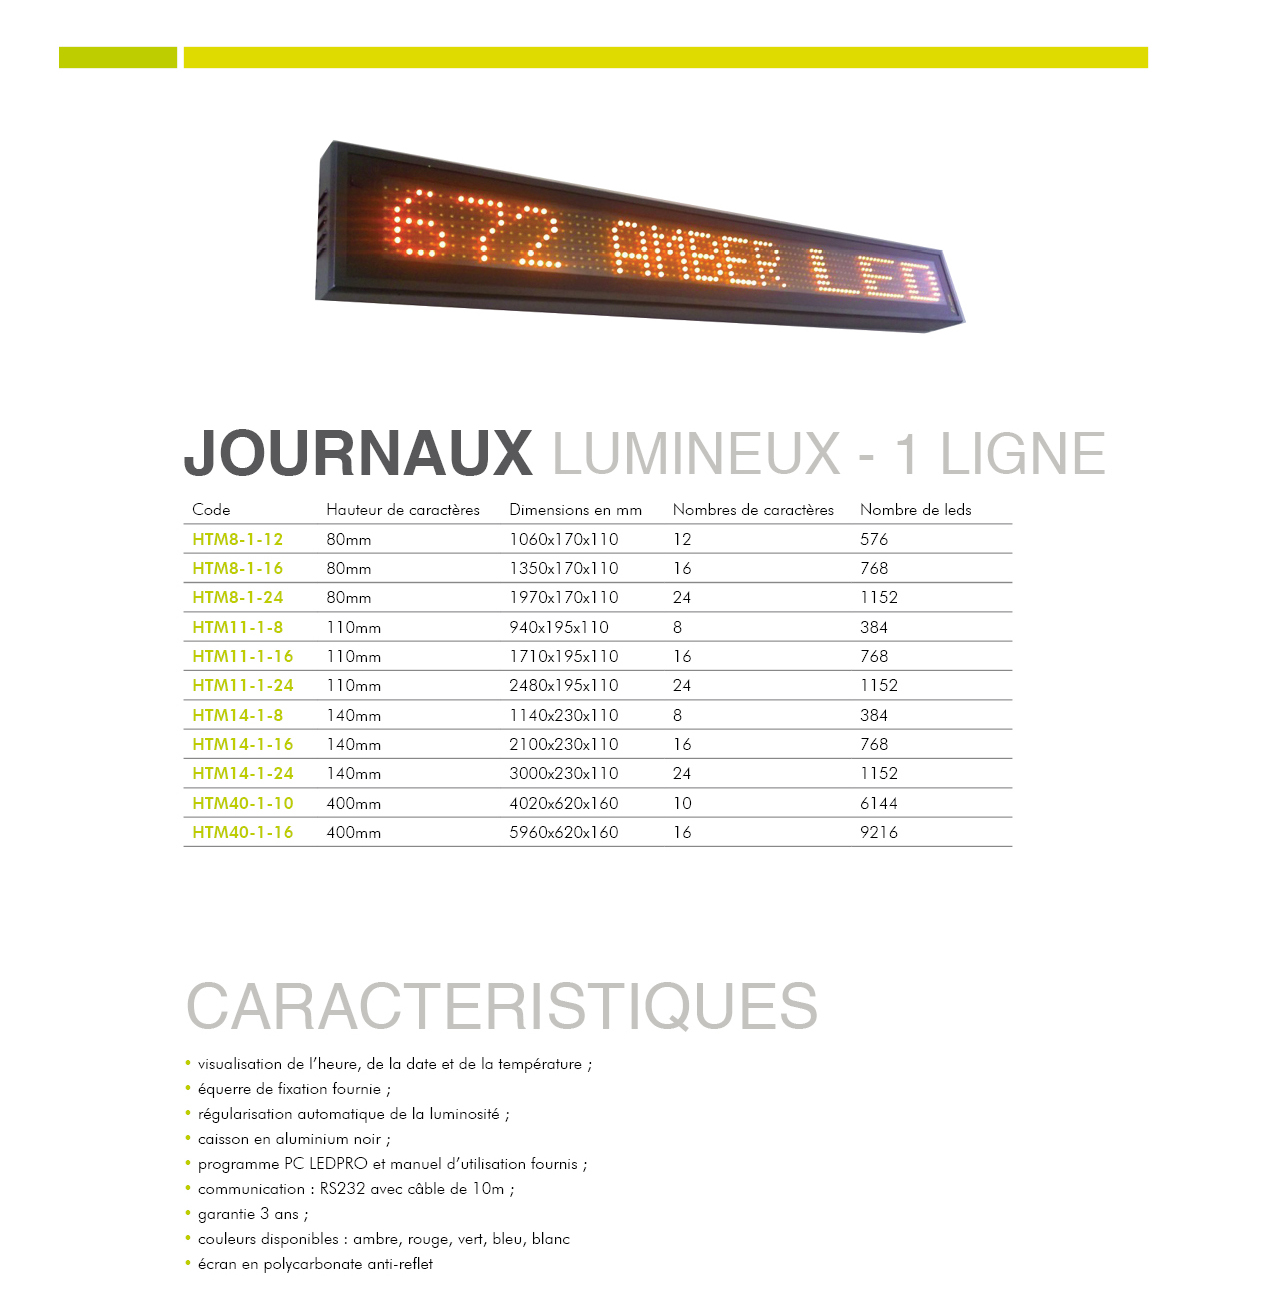 DEF-catalogue-gheury-23-06-2017175